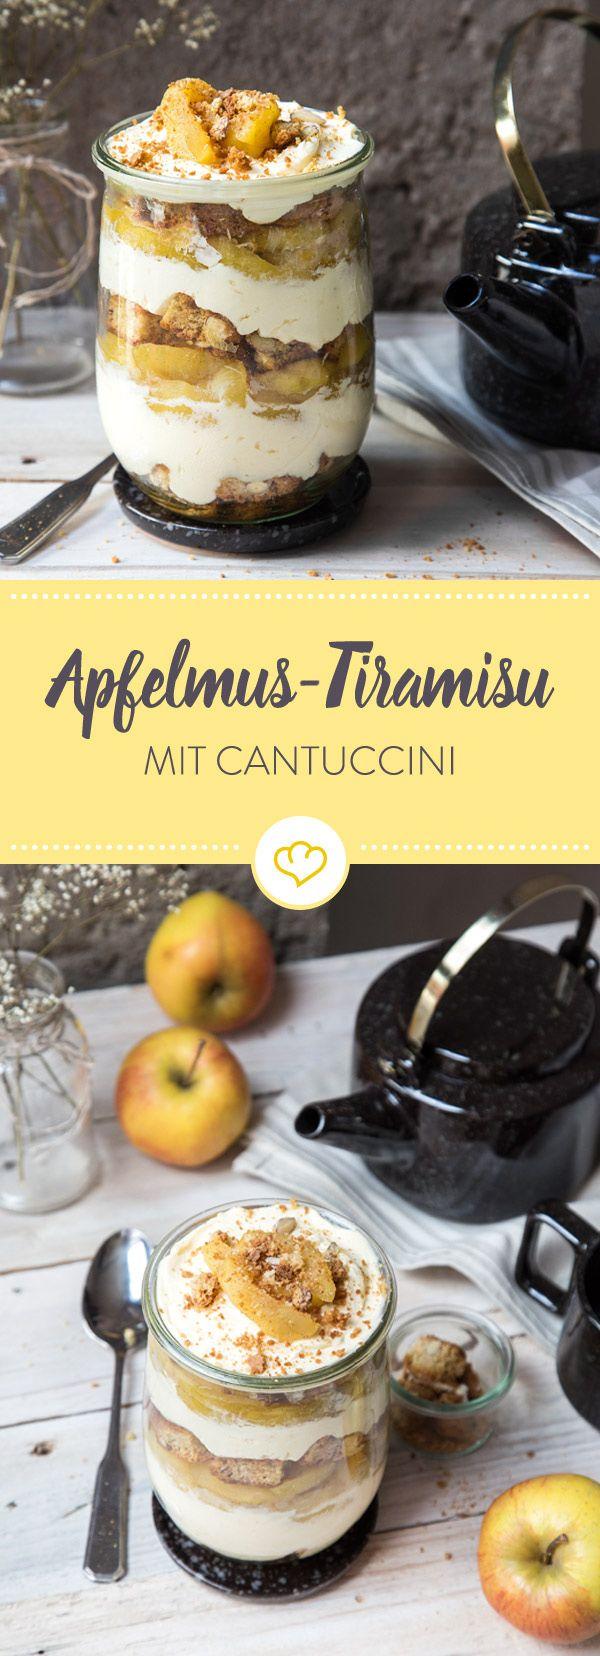 Apfelkompott-Tiramisu mit Cantuccini #grilleddesserts